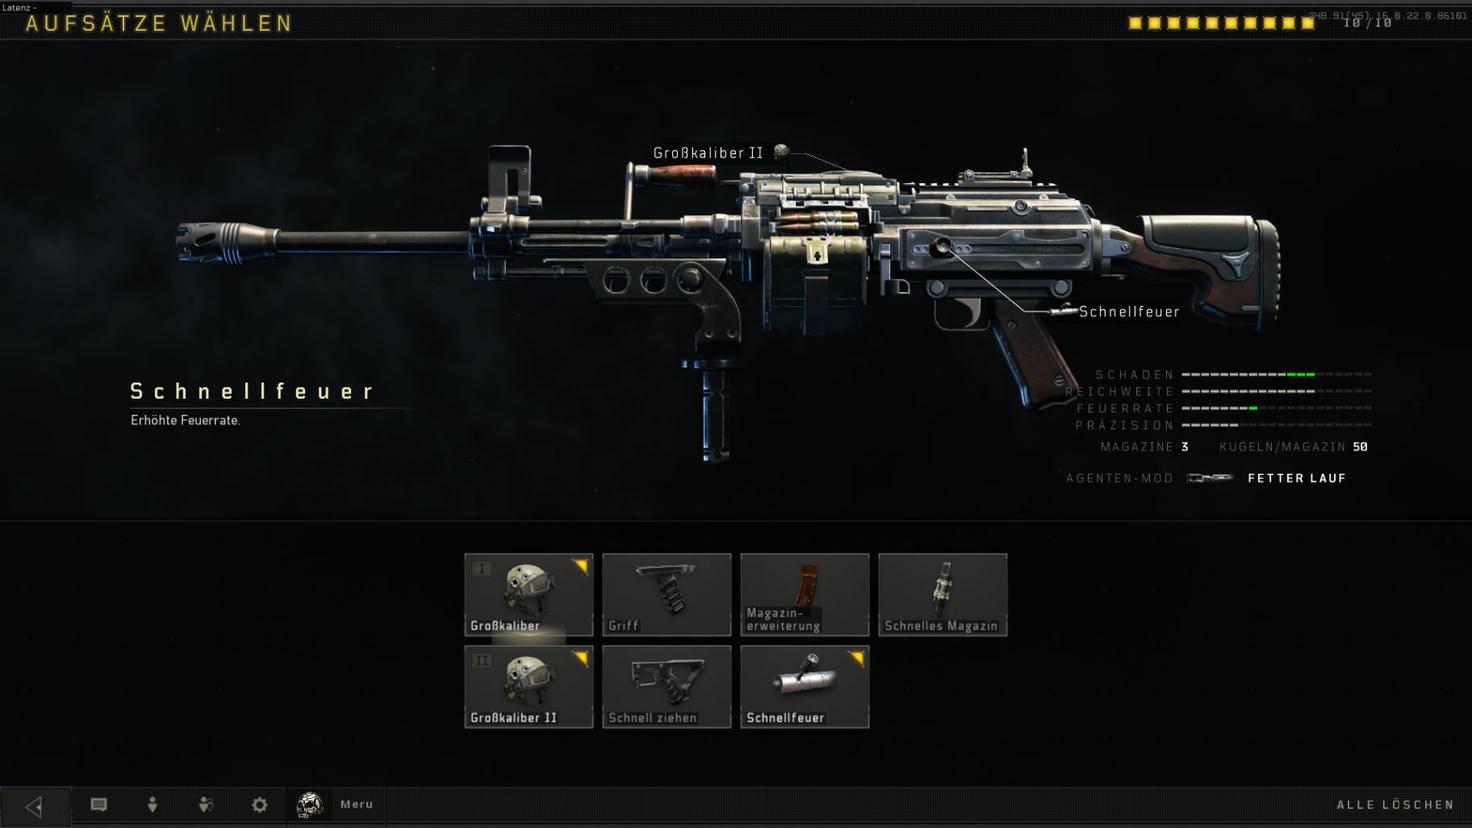 call-of-duty-black-ops-4-vkm-screenshot